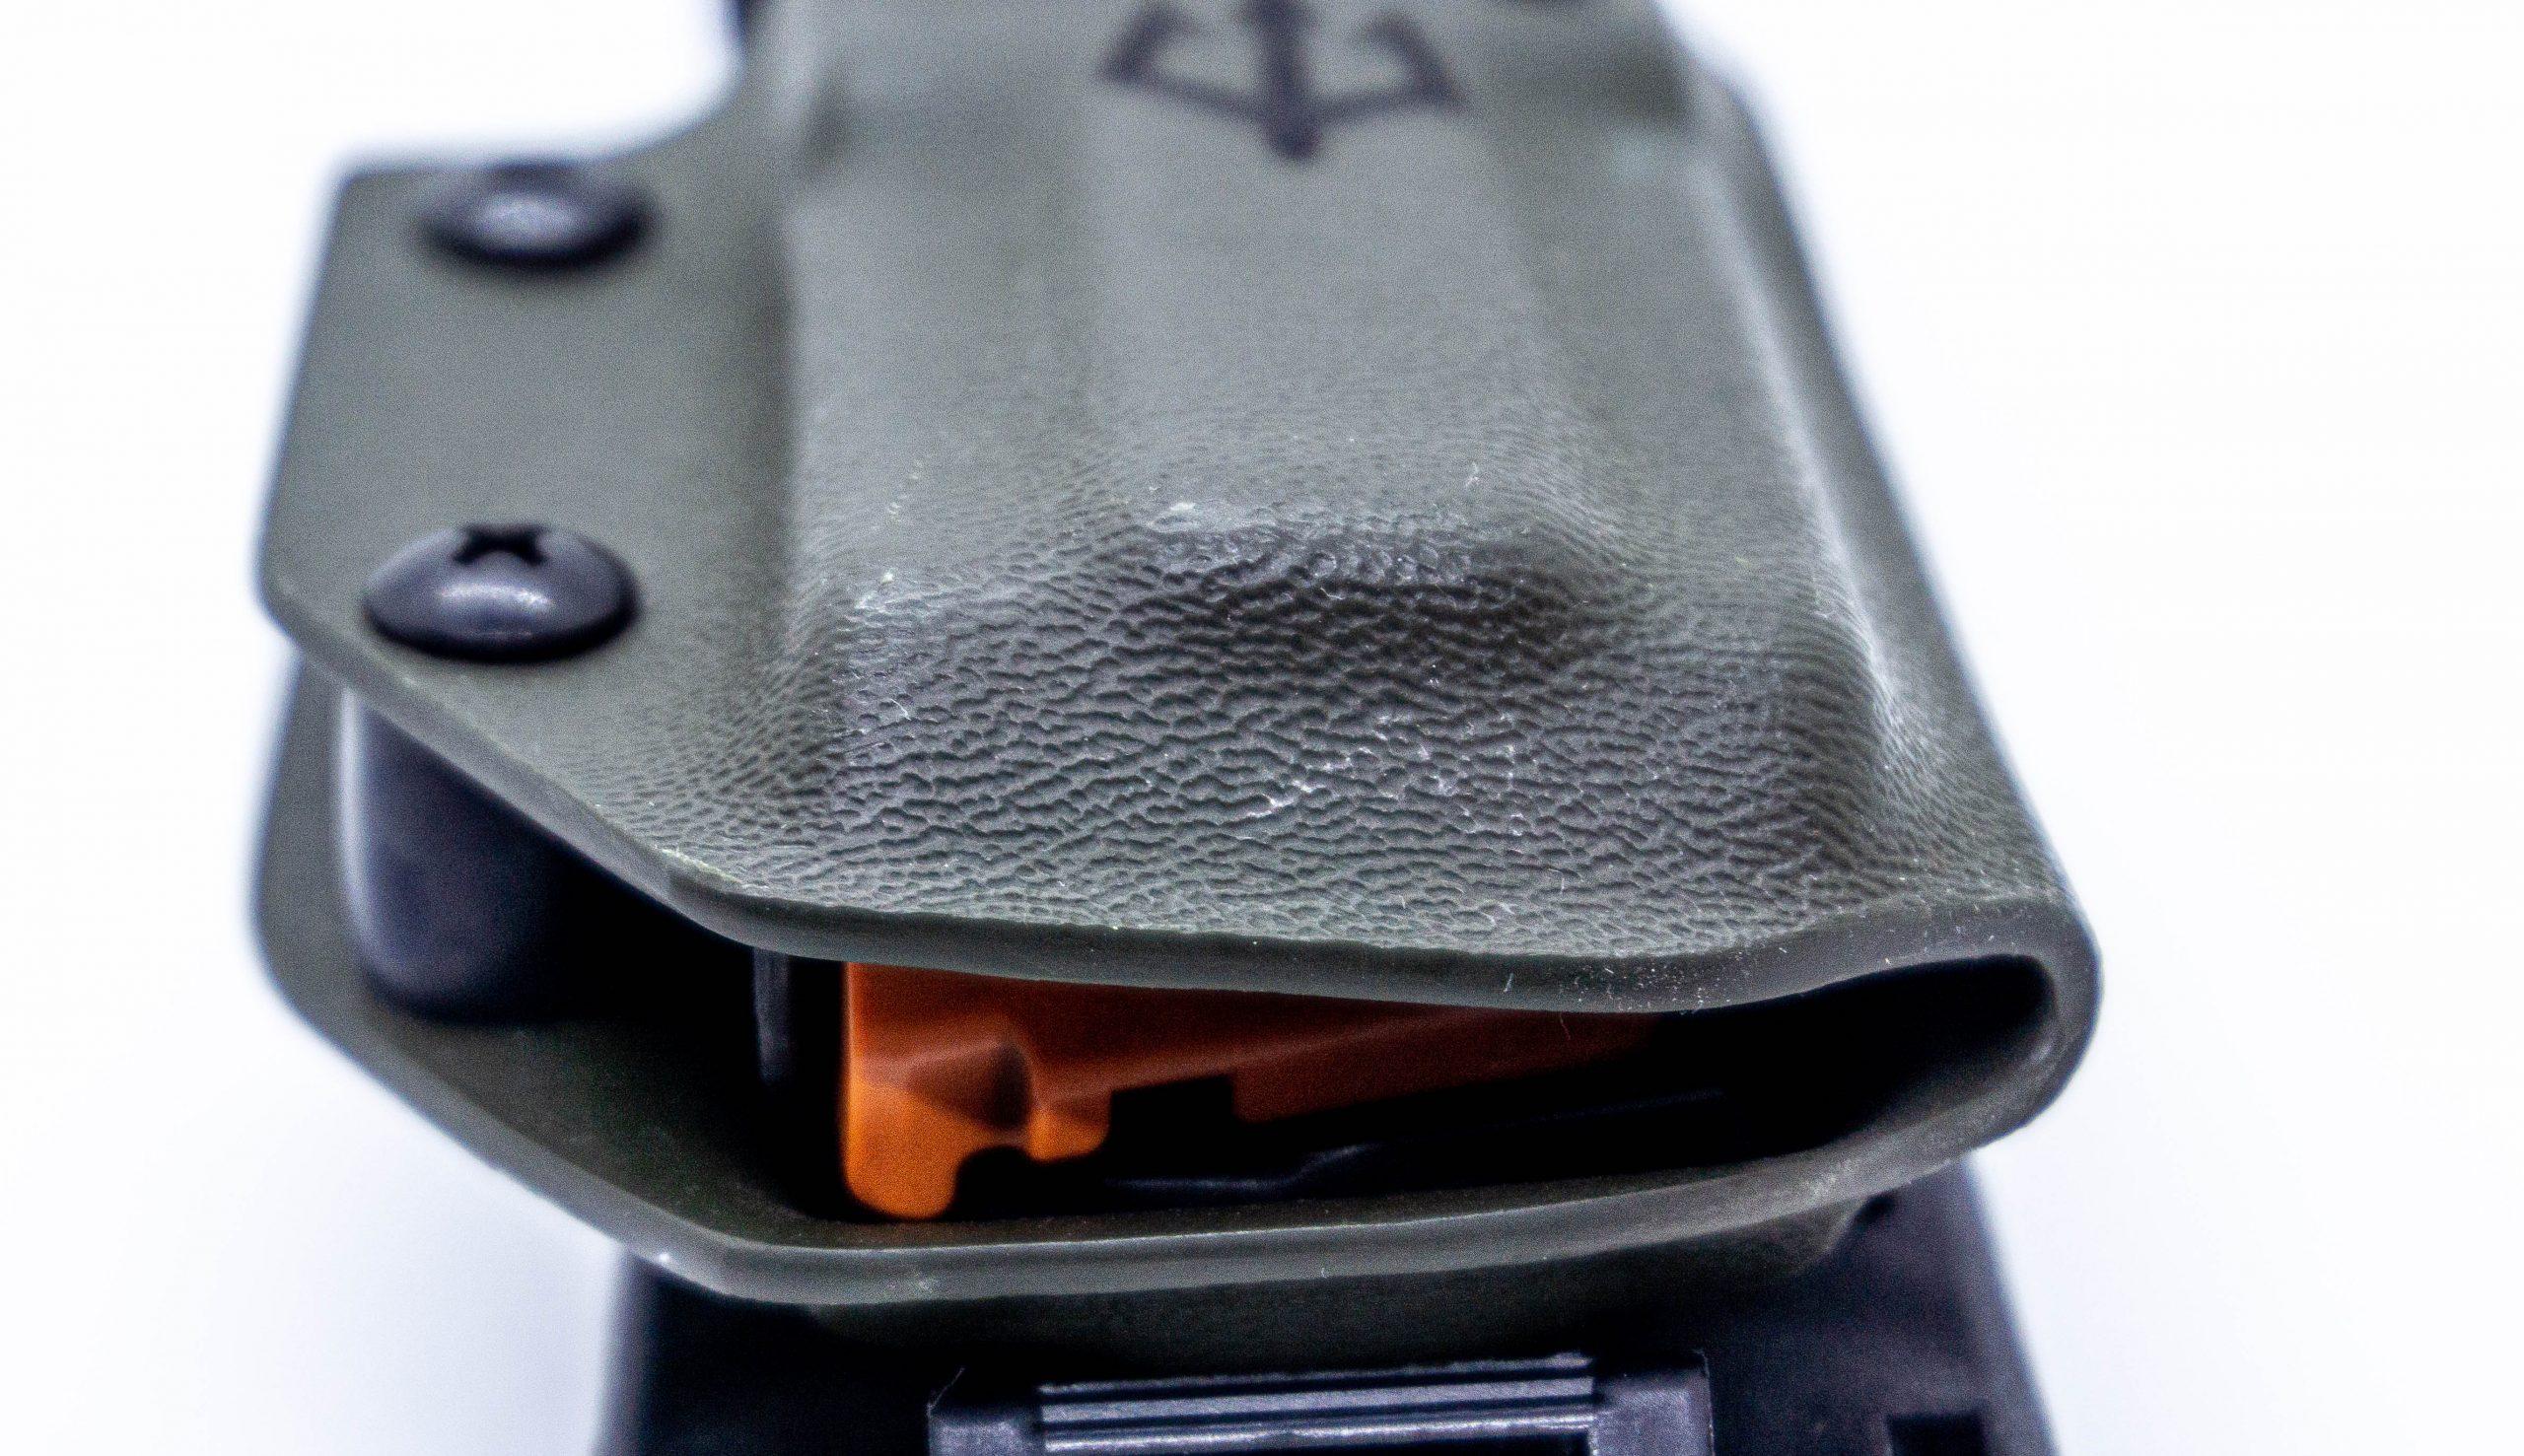 Black trident 9mm Kydex Mag Carrier